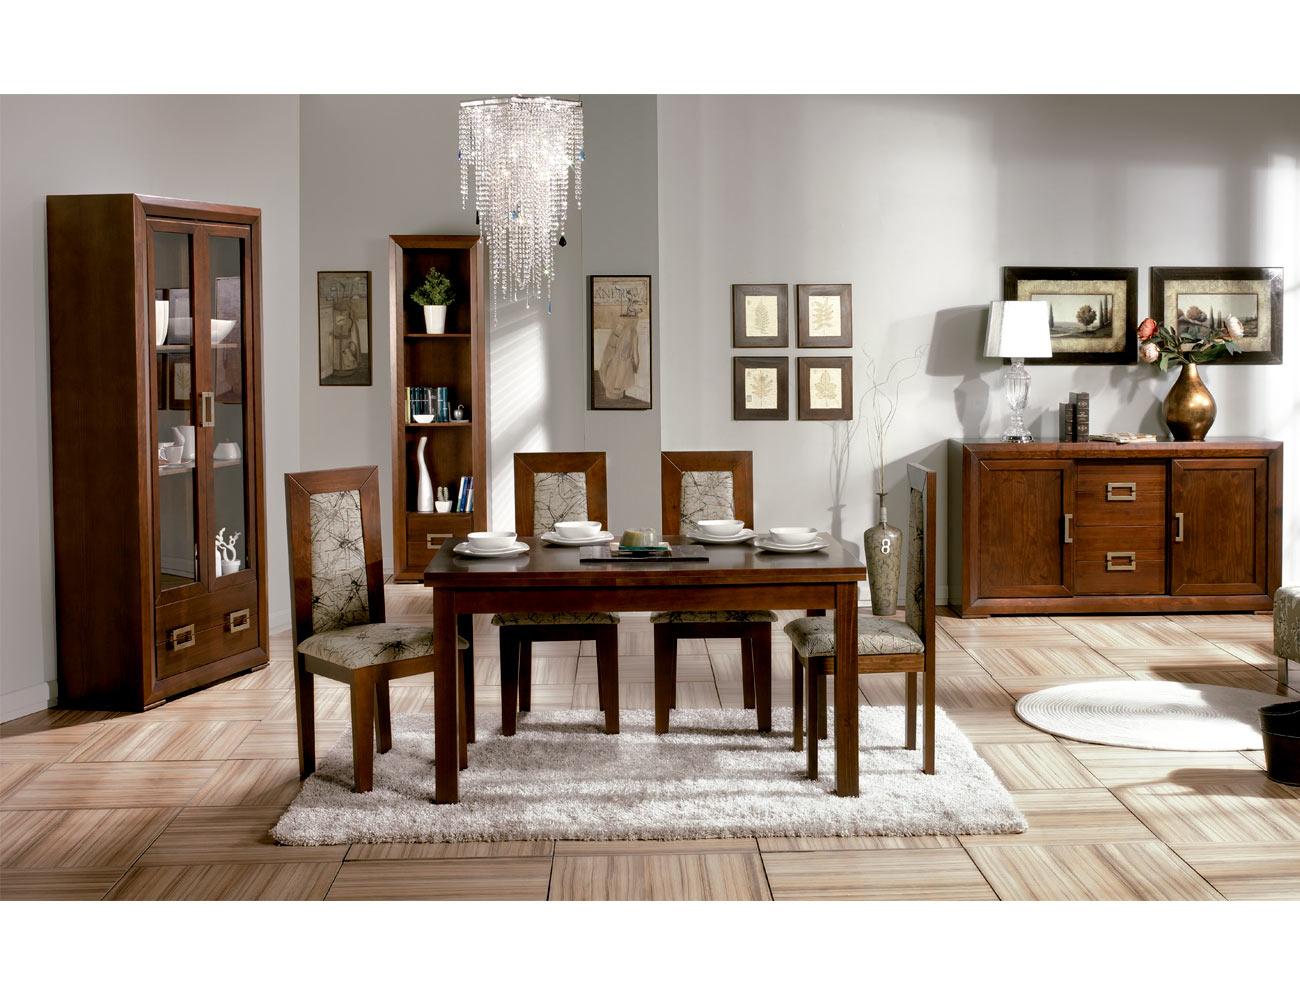 Composicion34 mueble salon comedor madera